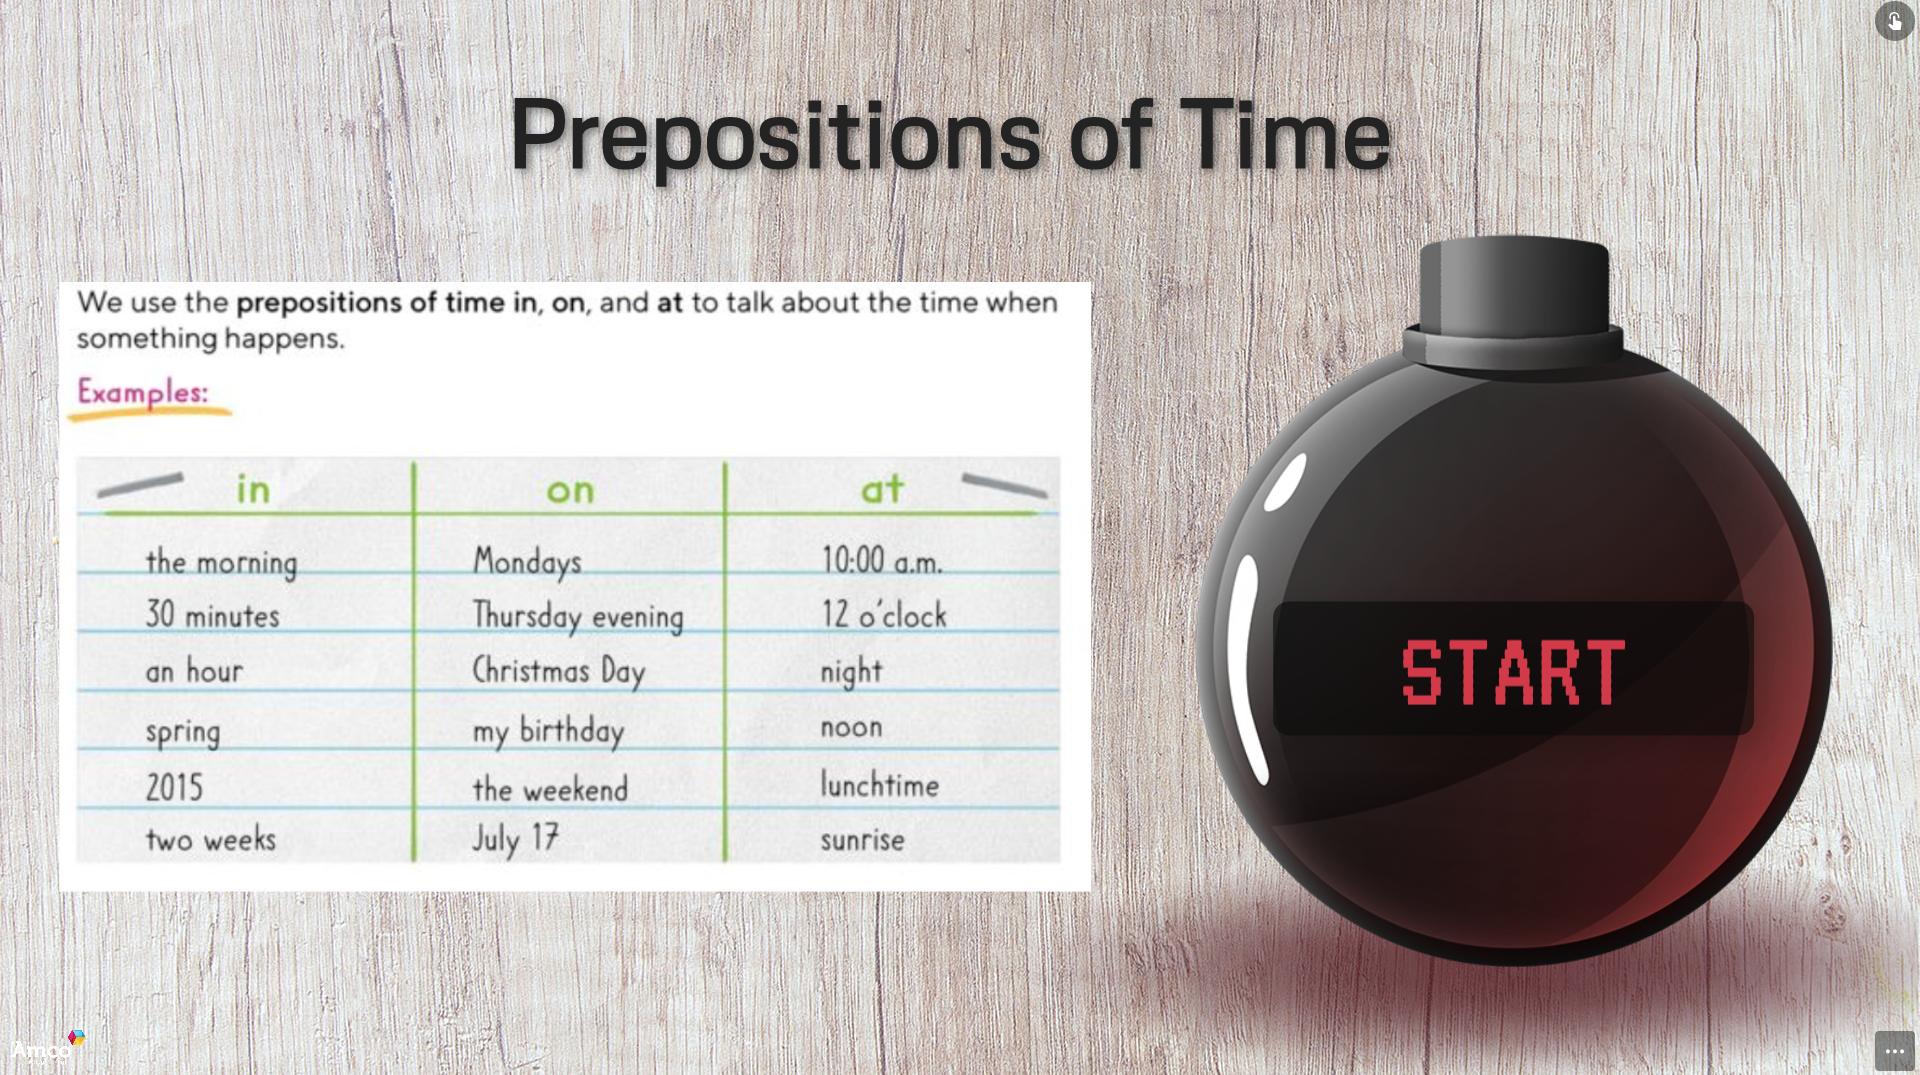 activity-prepositions